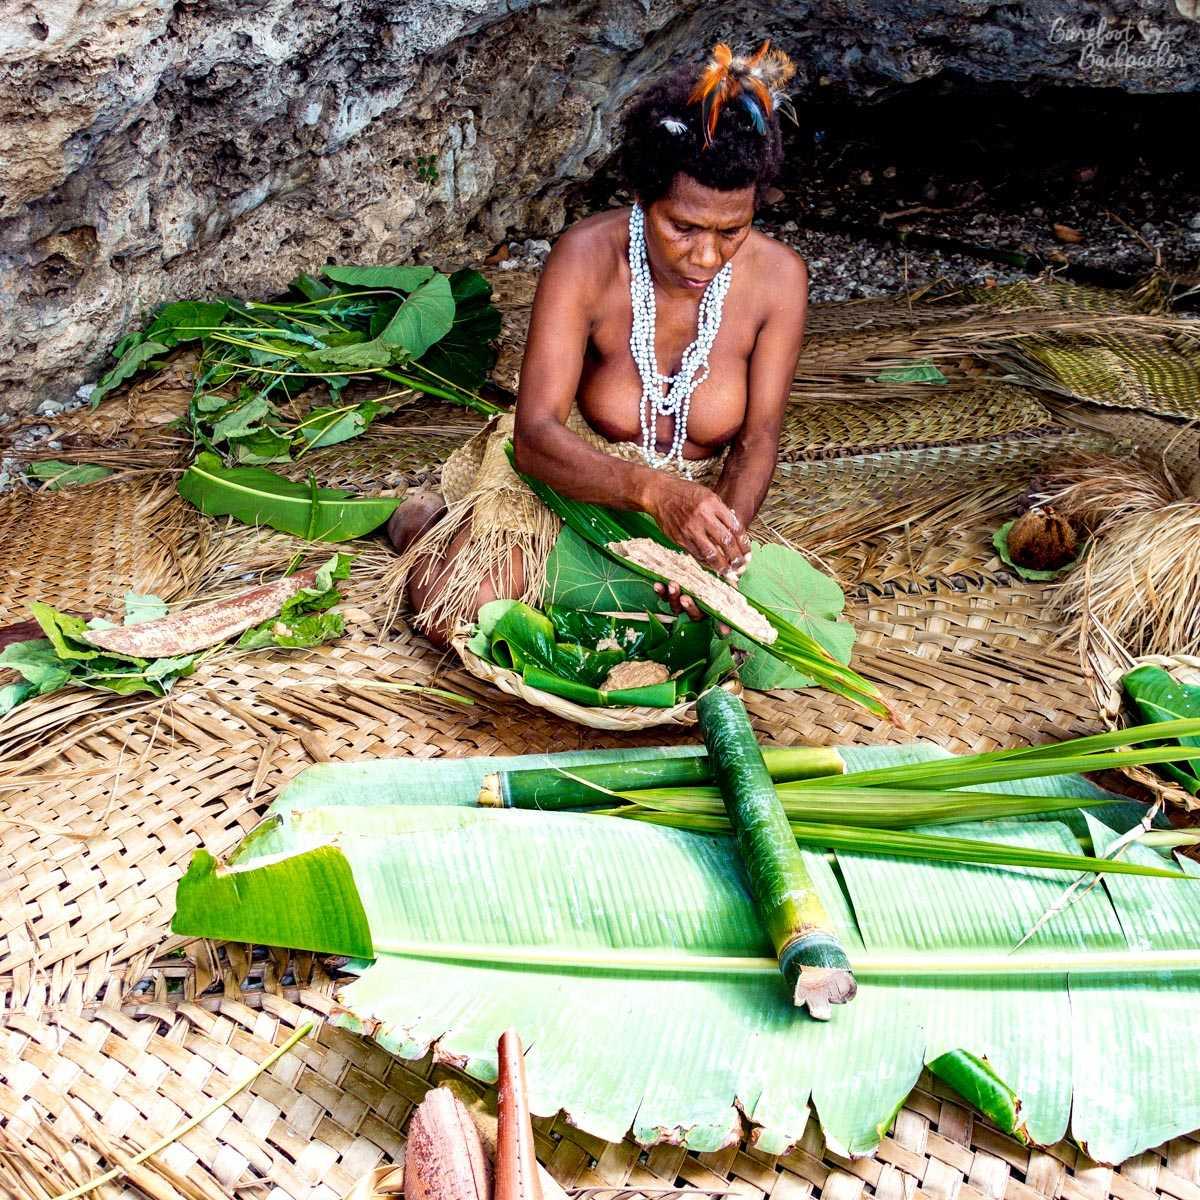 A tribeswoman making laplap.